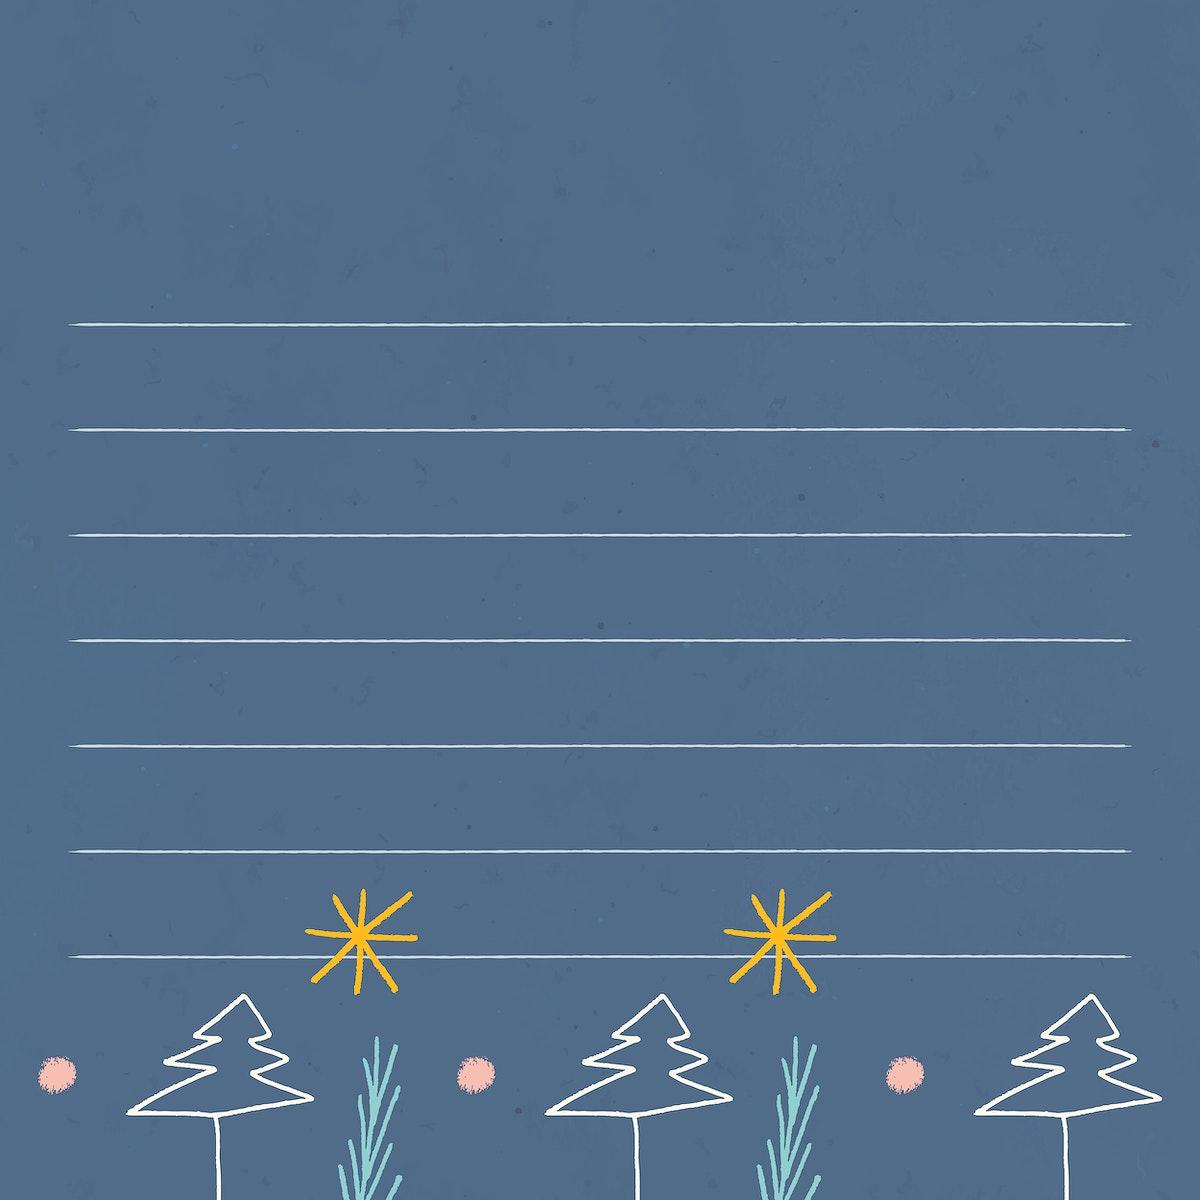 Christmas scribble pattern notepaper vector